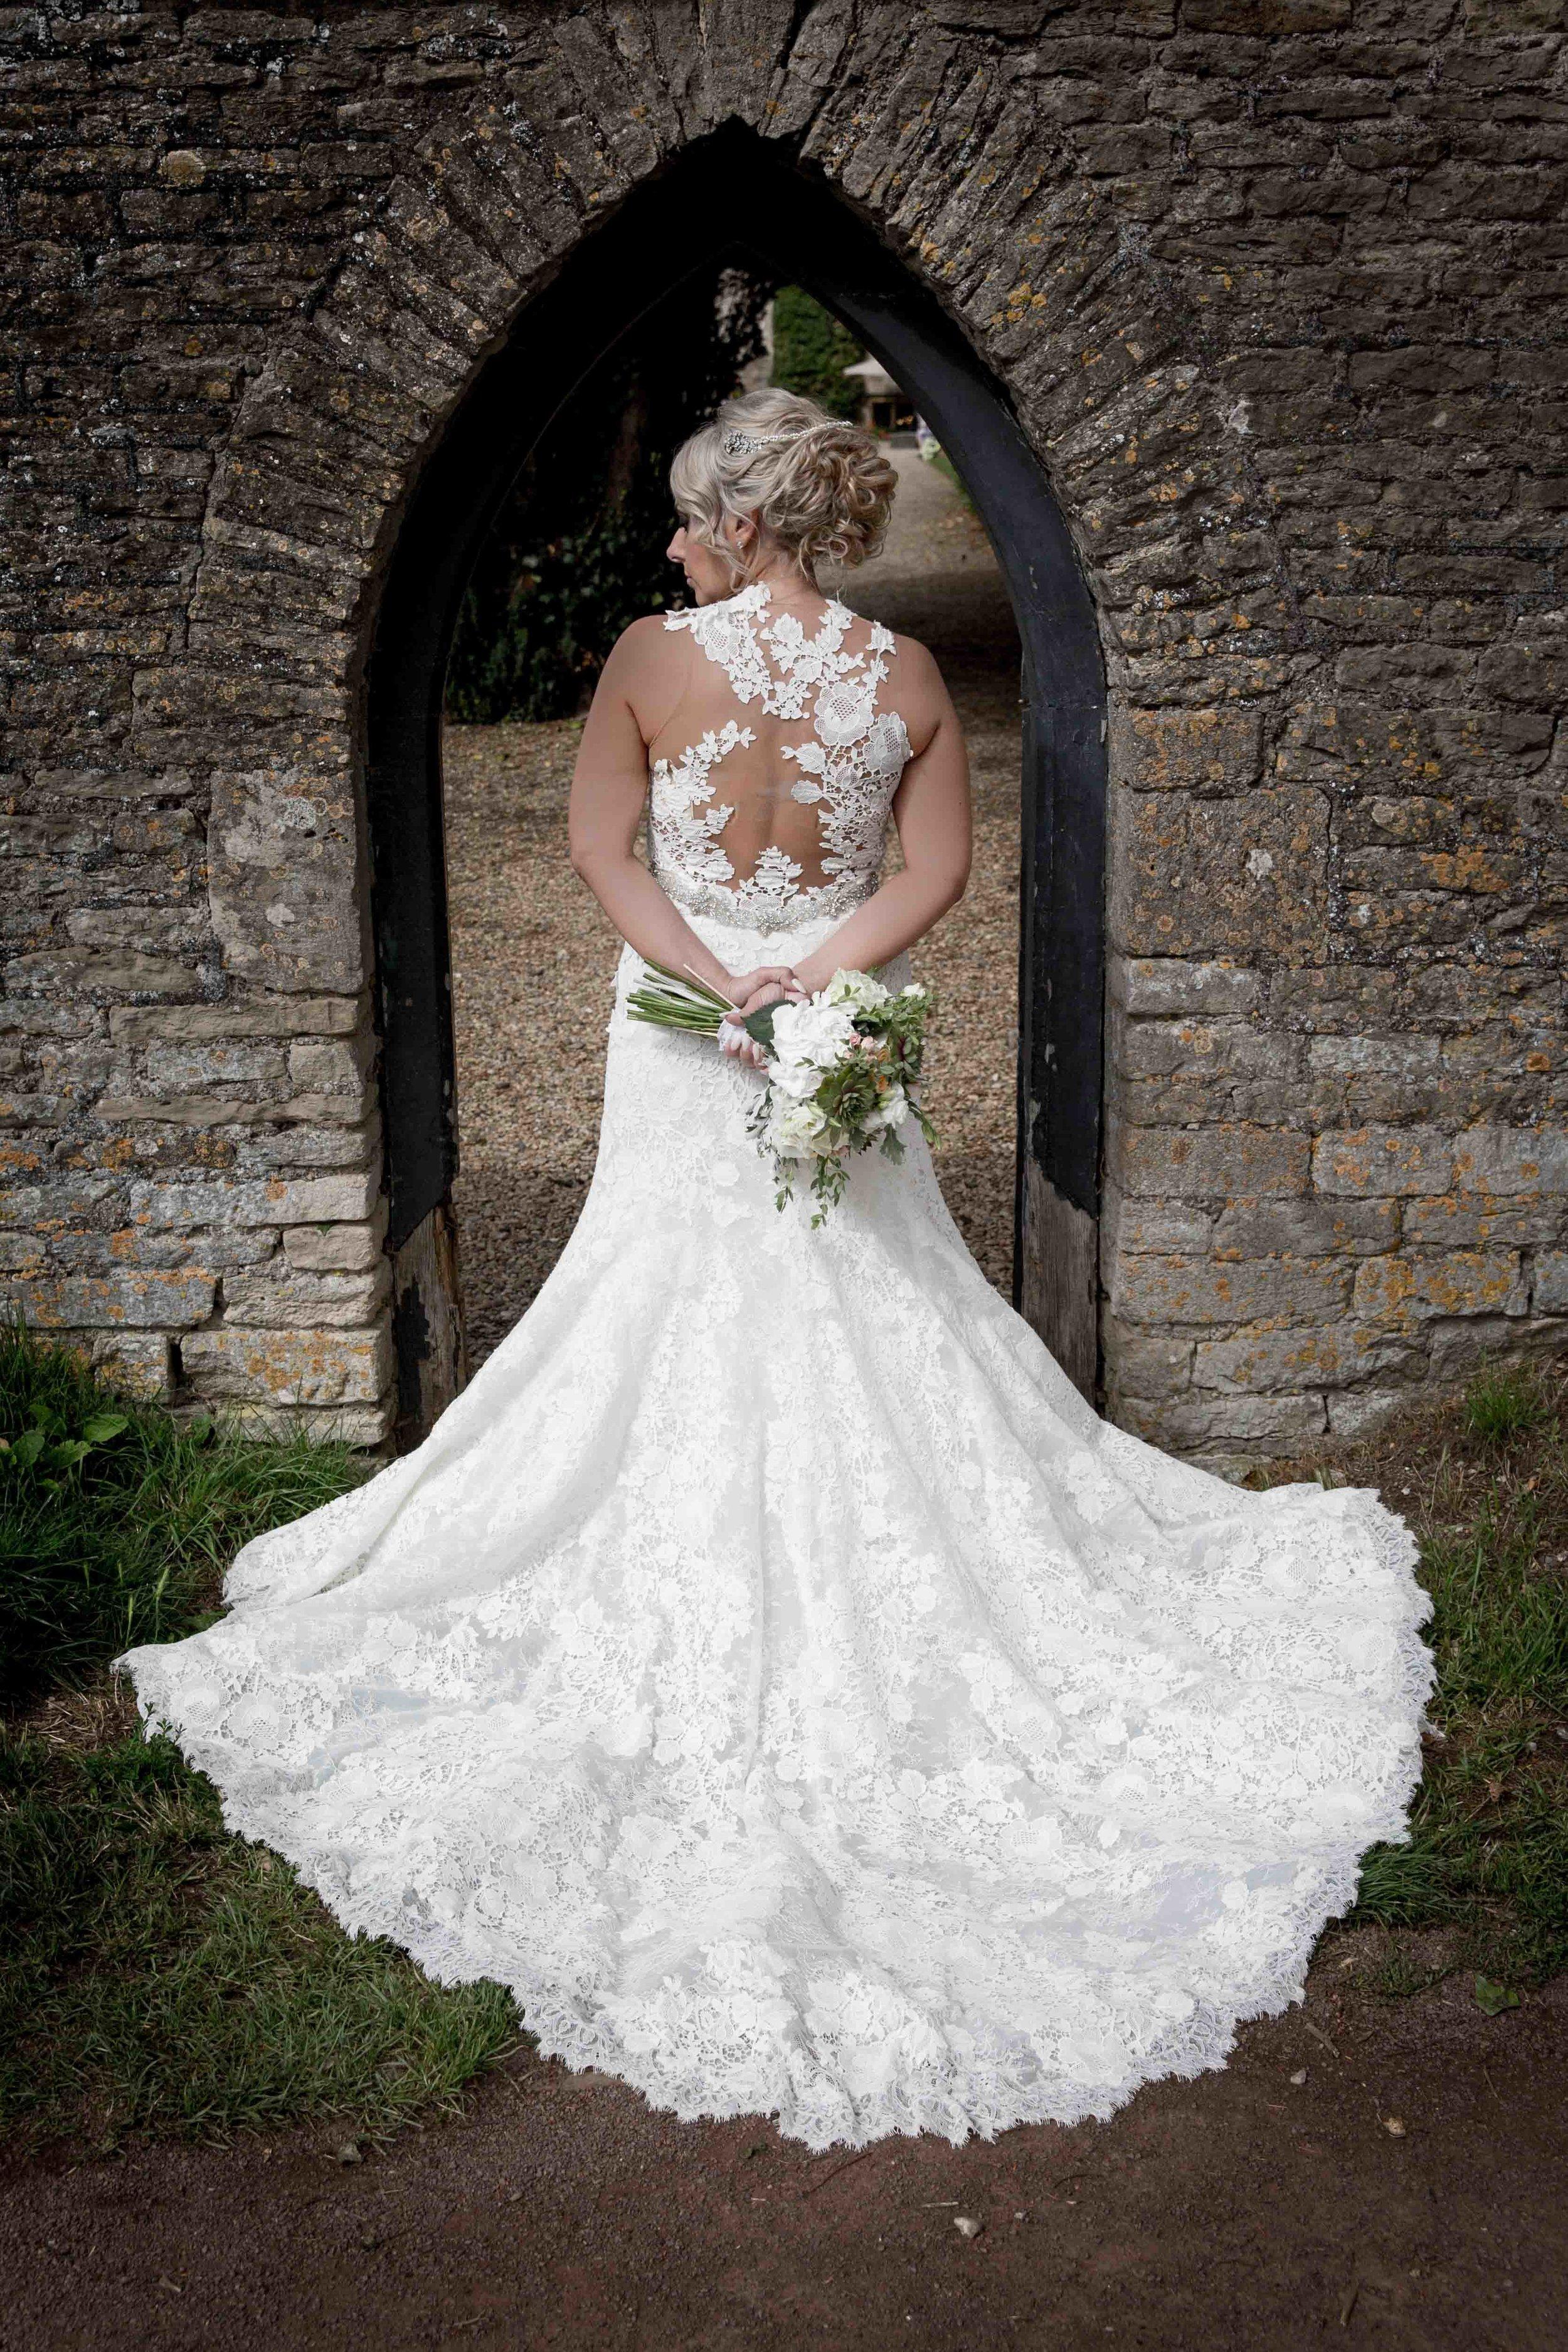 cotswold-wedding-photography-at-stonehouse-court-hotel-natalia-smith-photography-gloucestershire-wedding-photographer-67.jpg